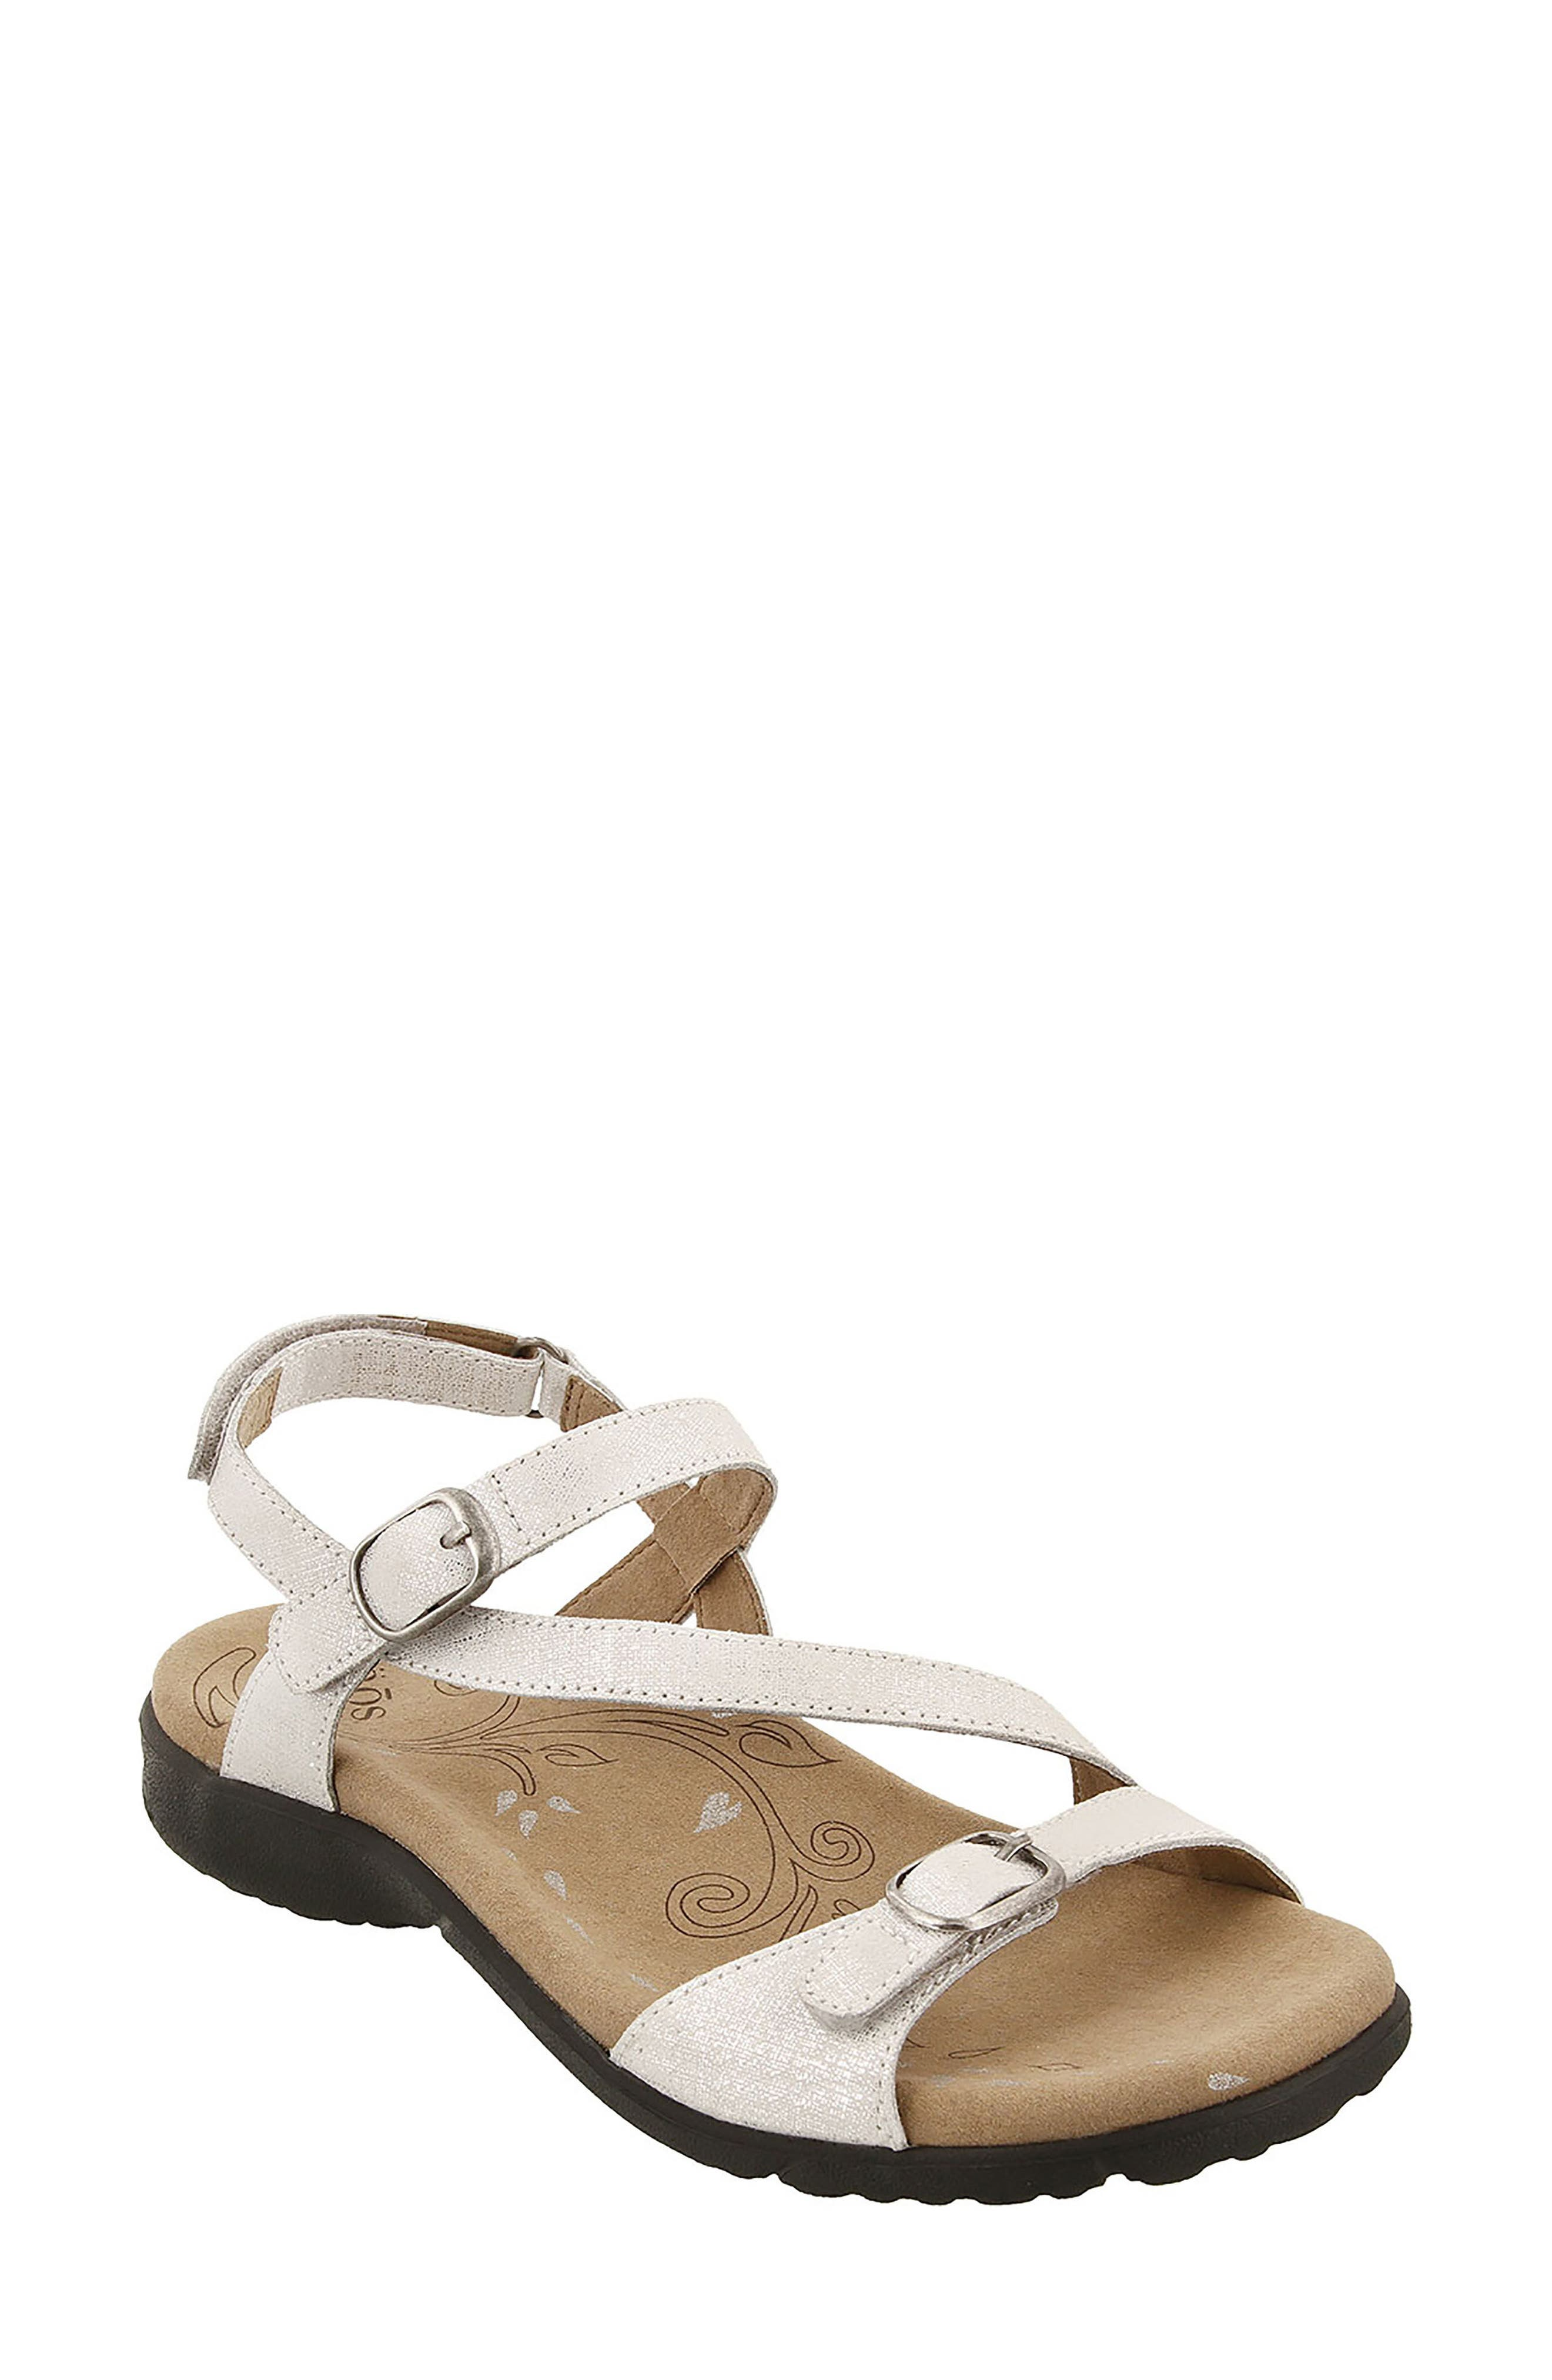 Beauty Sandal,                             Main thumbnail 1, color,                             White Metallic Leather